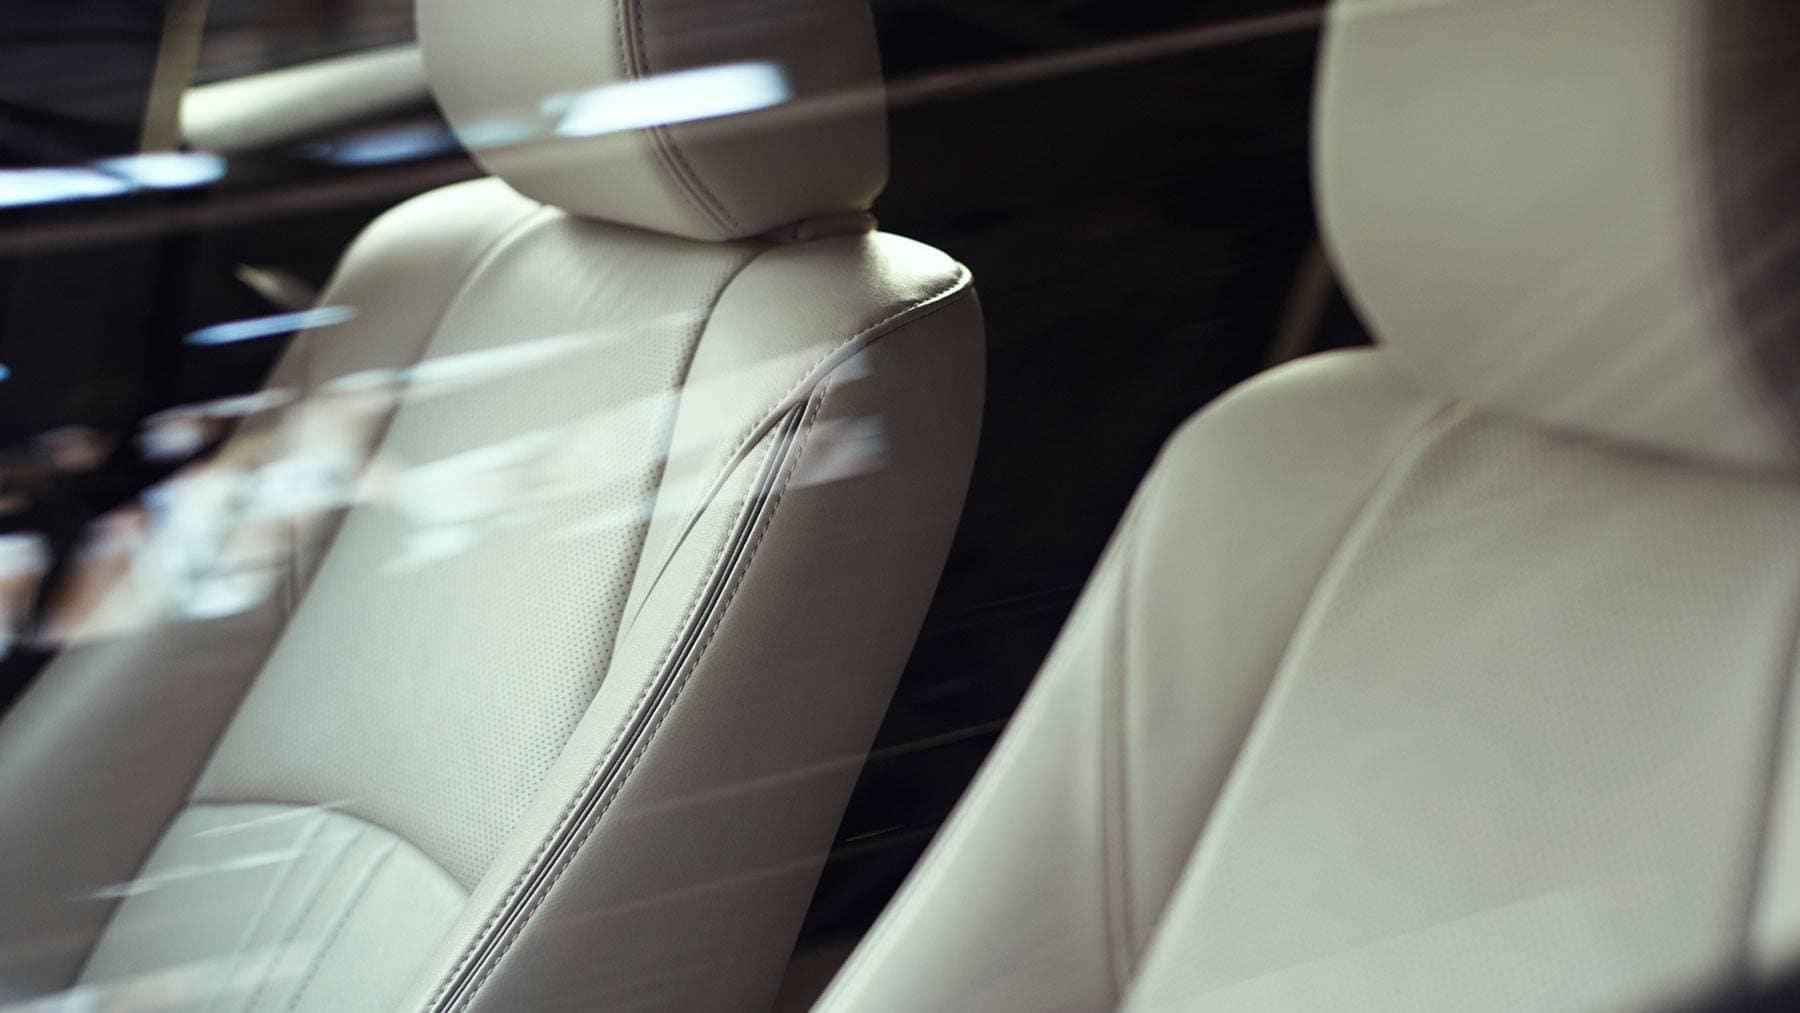 2019 Mazda CX-3 front seats